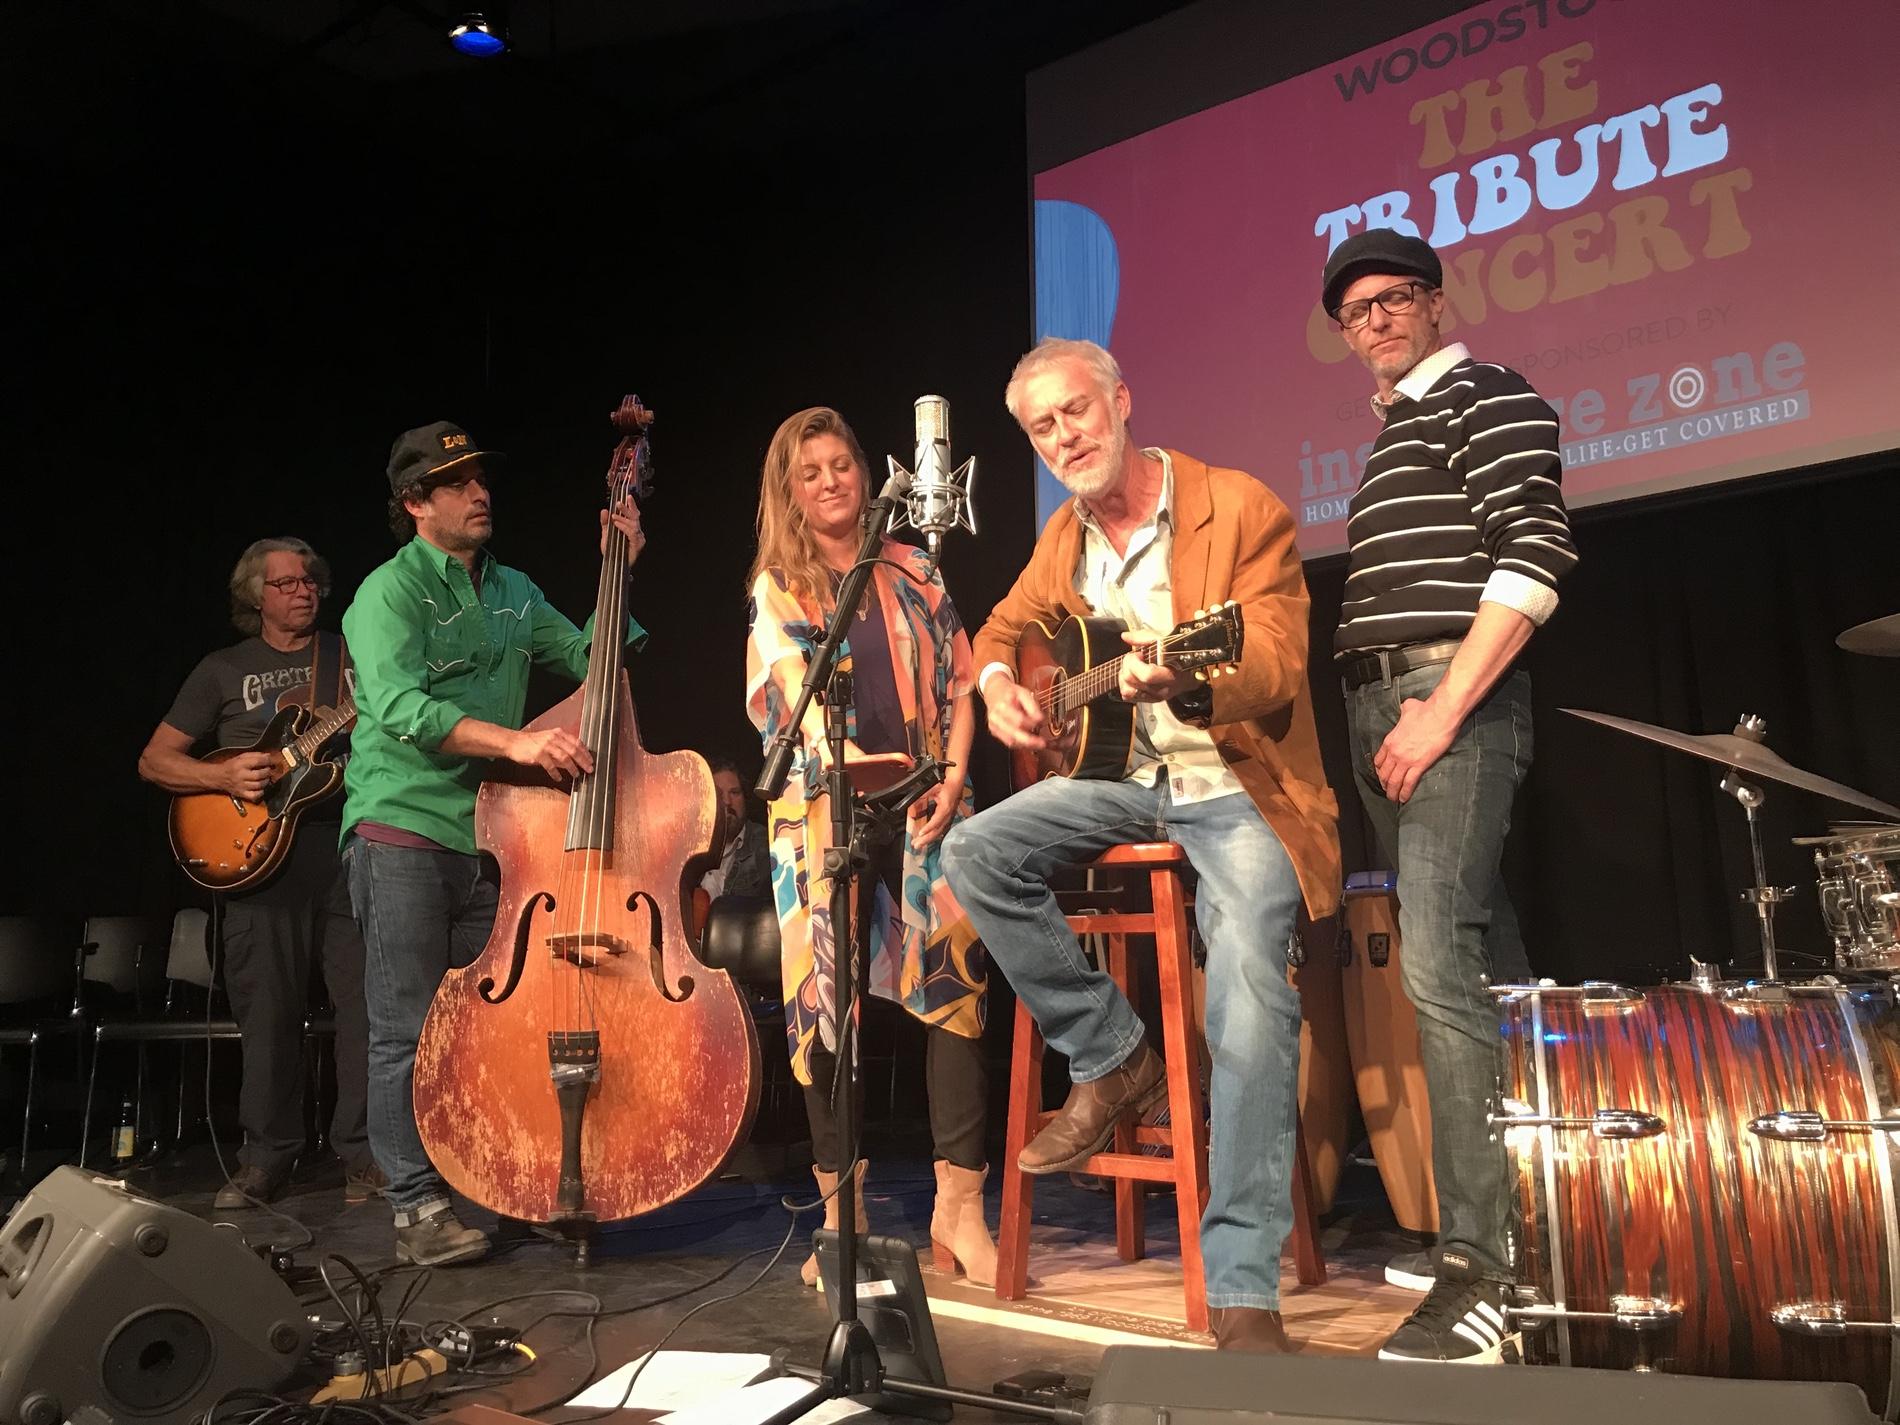 Seaside REP Woodstock Tribute Concert November 2019